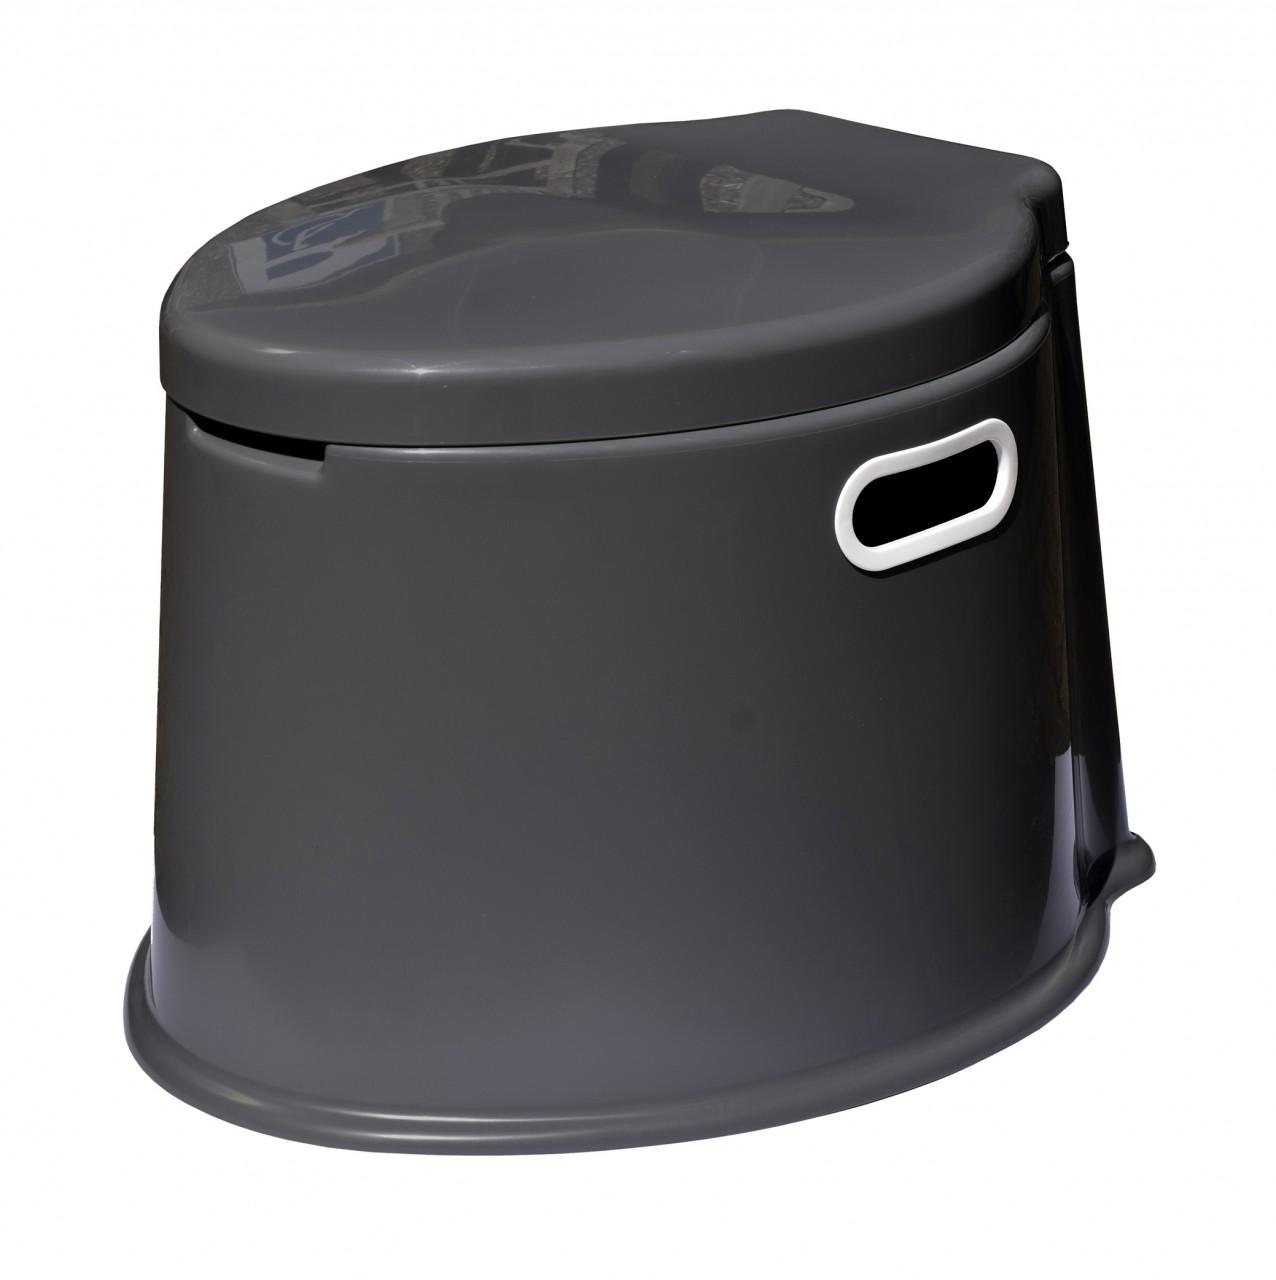 navyline mobile eimer toilette in 4 farben f r boot caravan gartenlaube uvm ebay. Black Bedroom Furniture Sets. Home Design Ideas